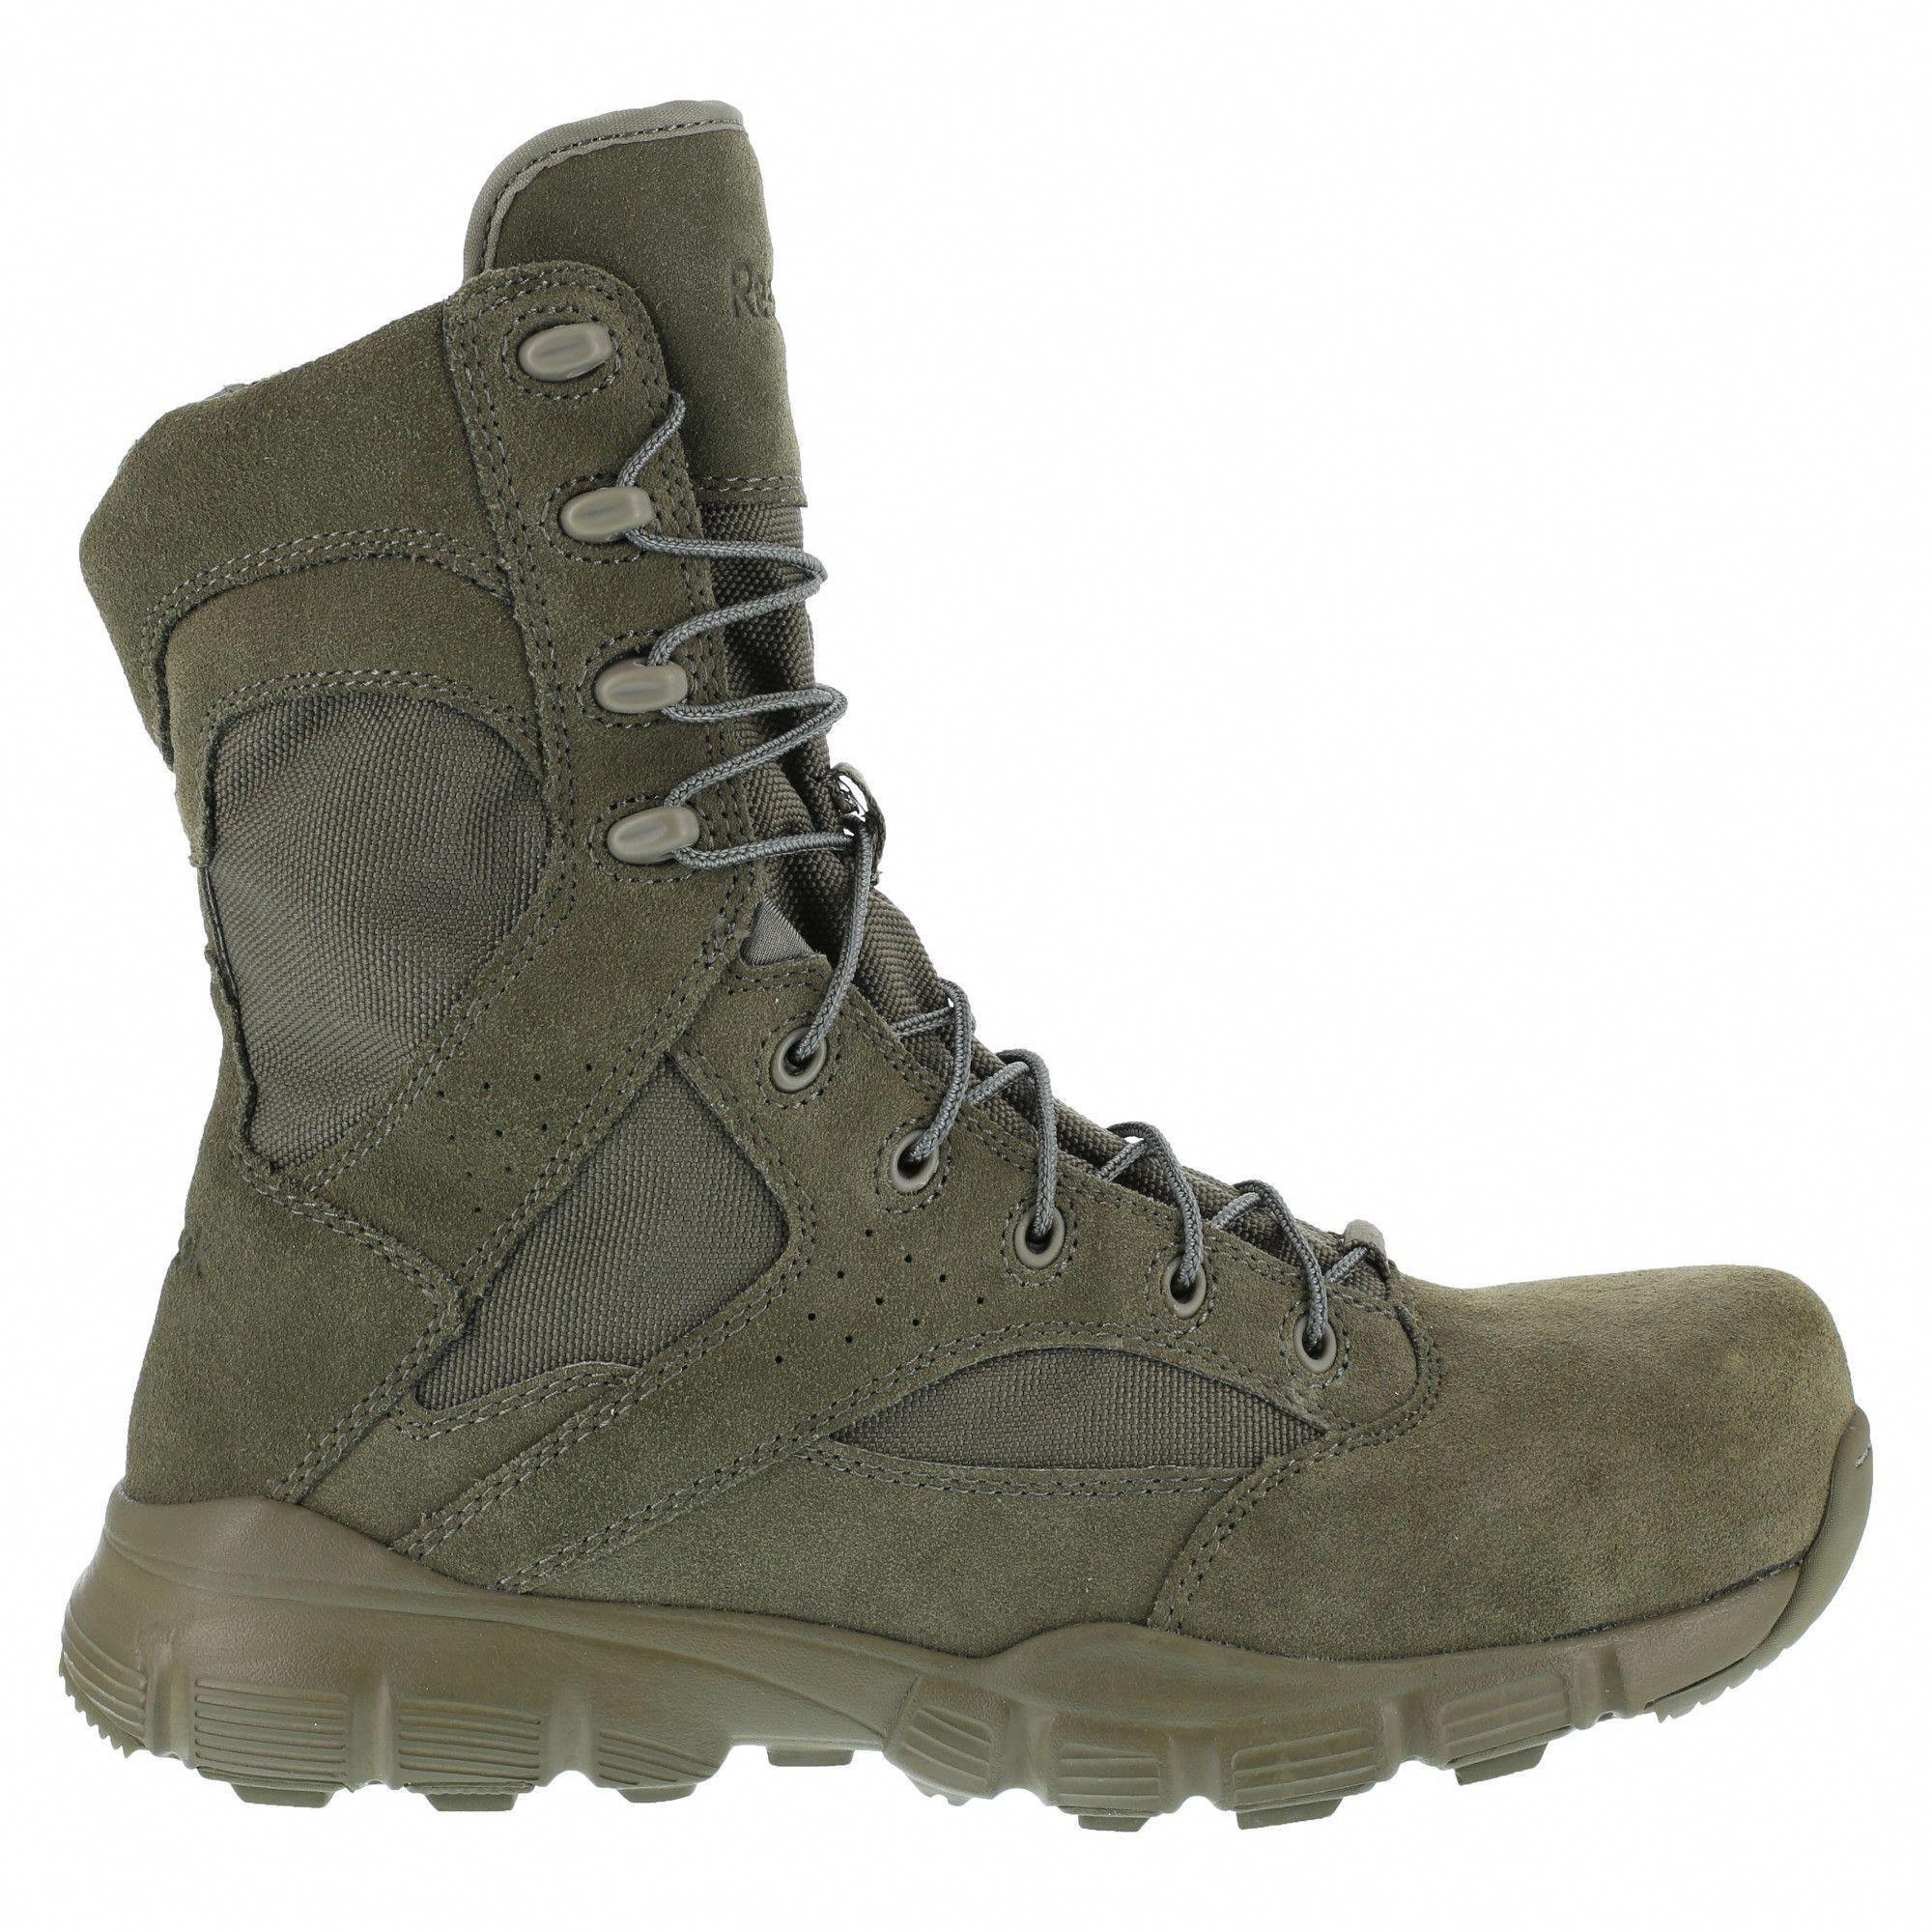 437eb8975d9 Men s UA Valsetz x DTLR Boots